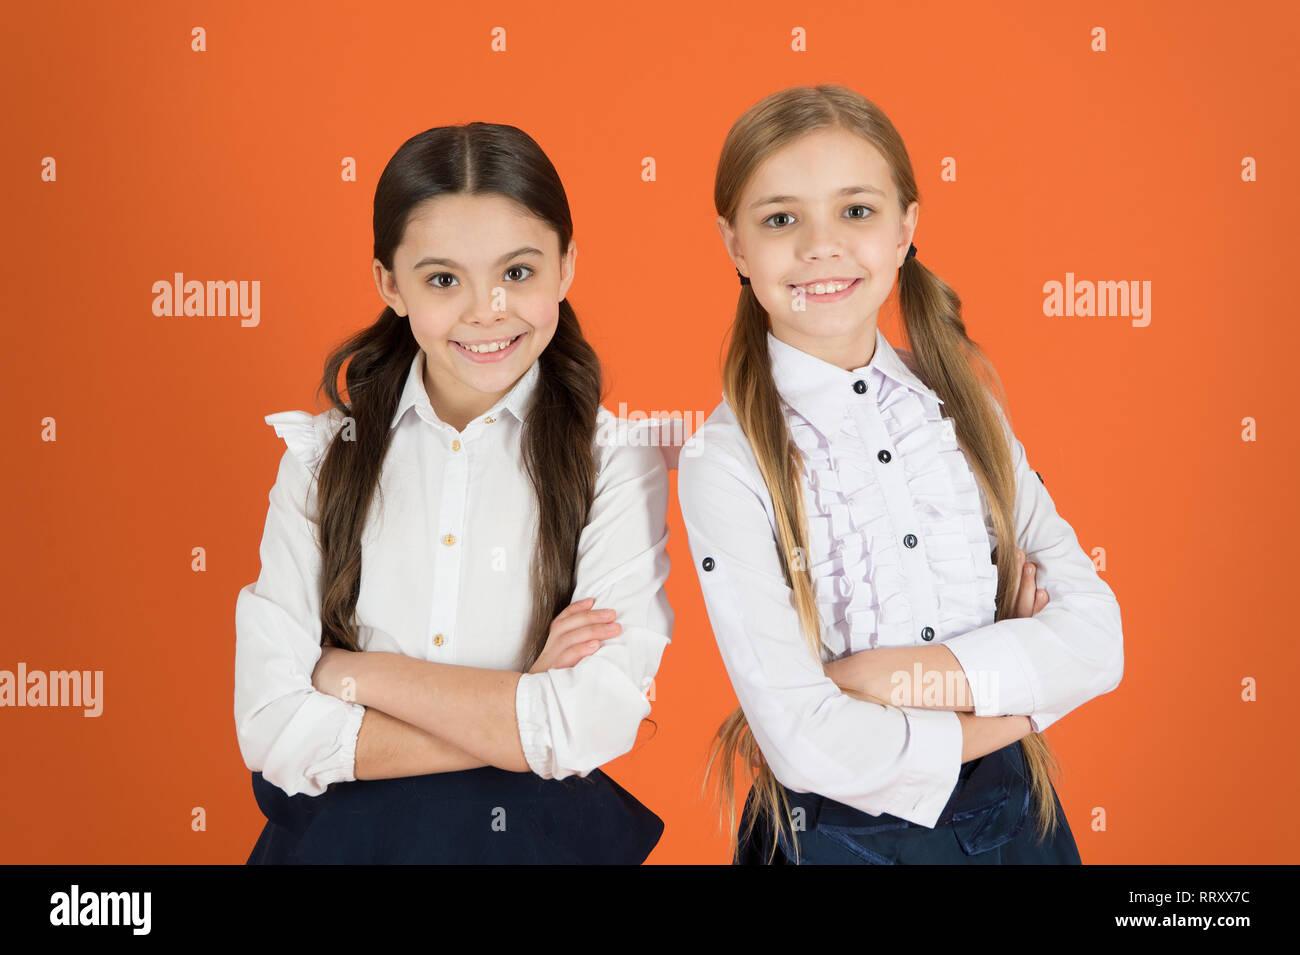 e706965f5ab9 Cute schoolgirls. Little girls wearing school uniform. Stylish girls in  pigtails dressed for school. Back to school fashion style.